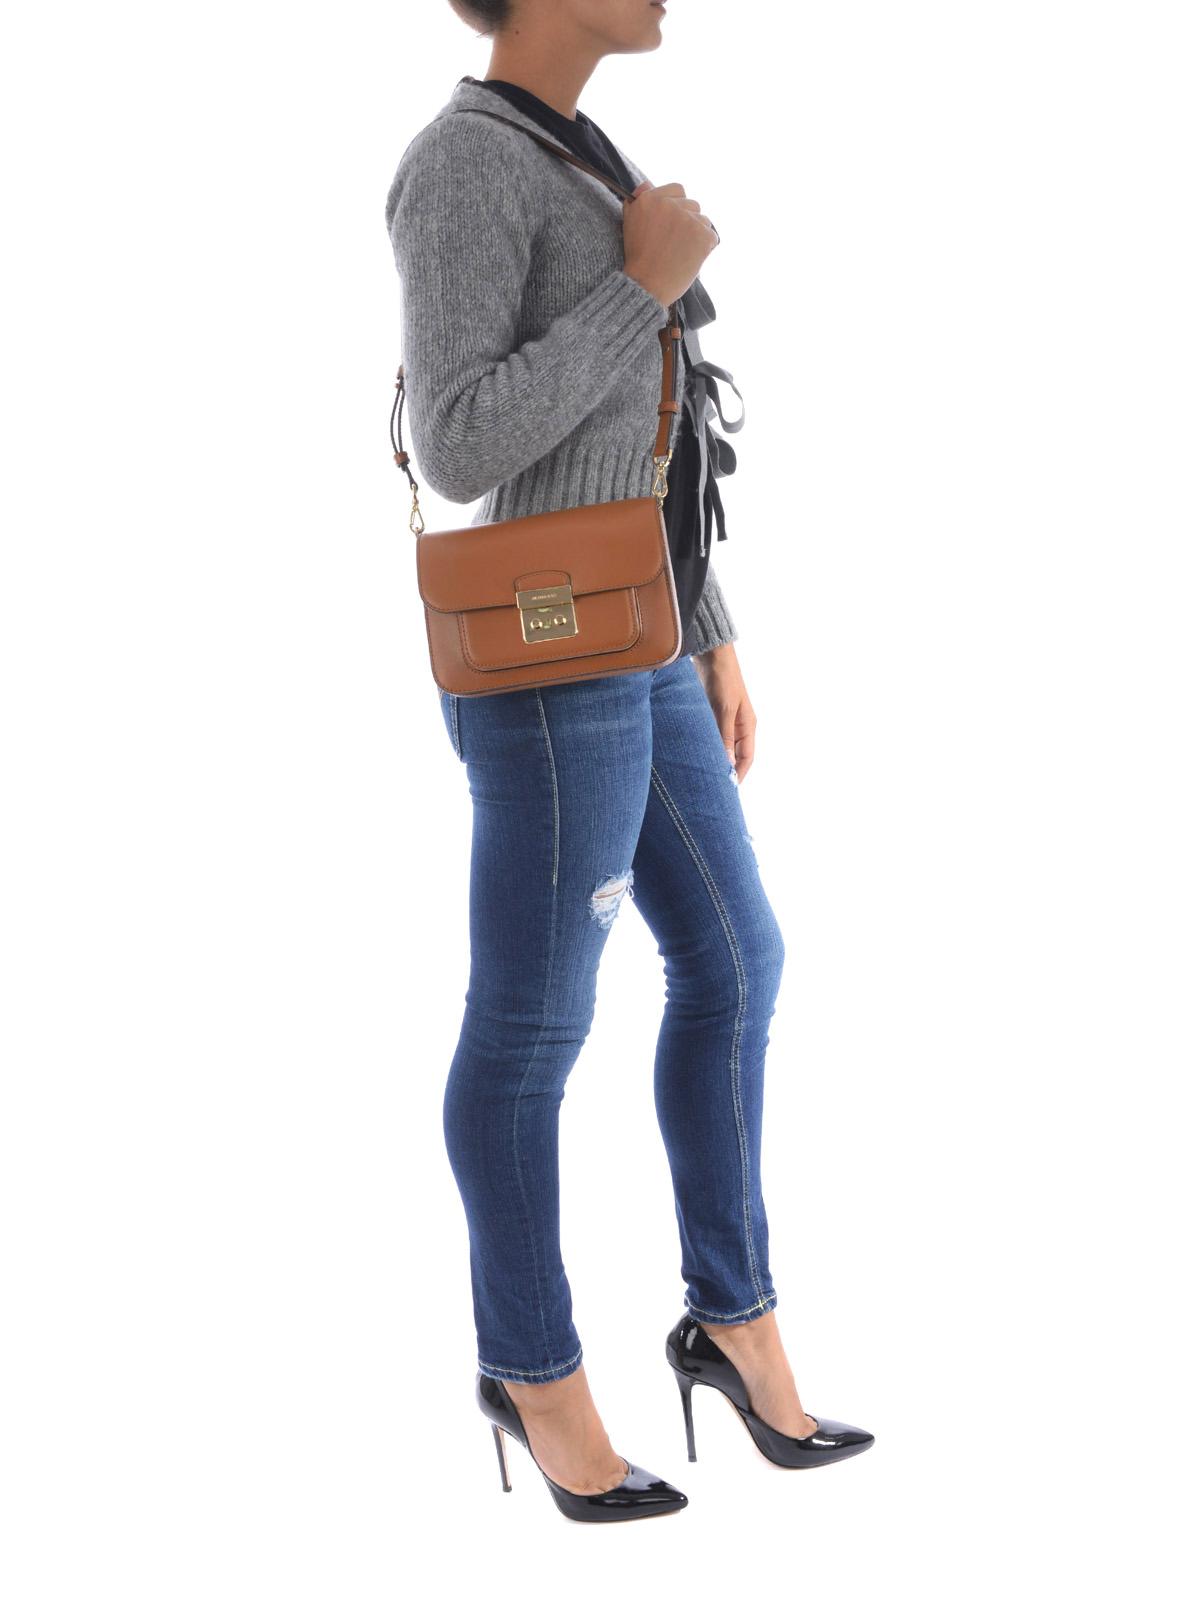 071b7e4df65b Michael Kors - Sloan Editor large leather bag - shoulder bags ...